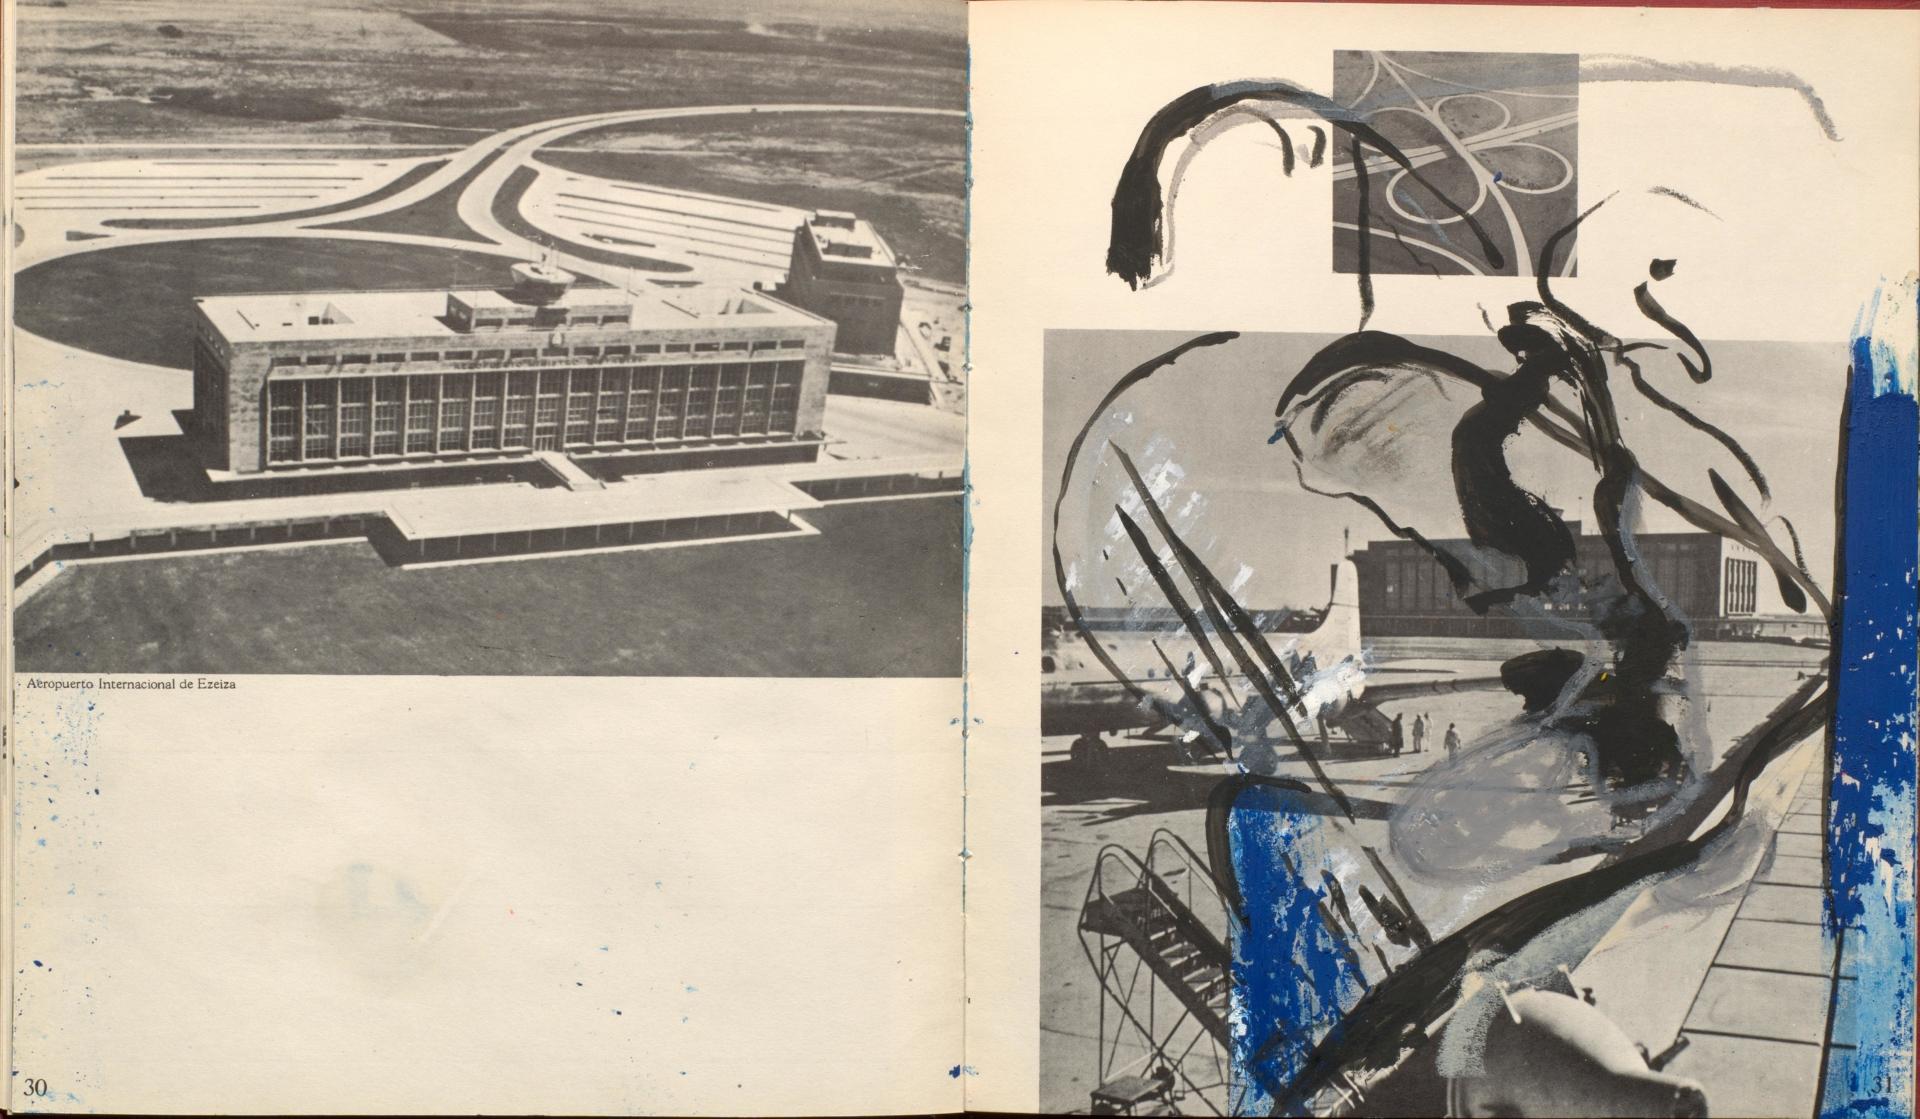 laboratorium haus 1 Heiko Wennesz grafik 7-book argentina